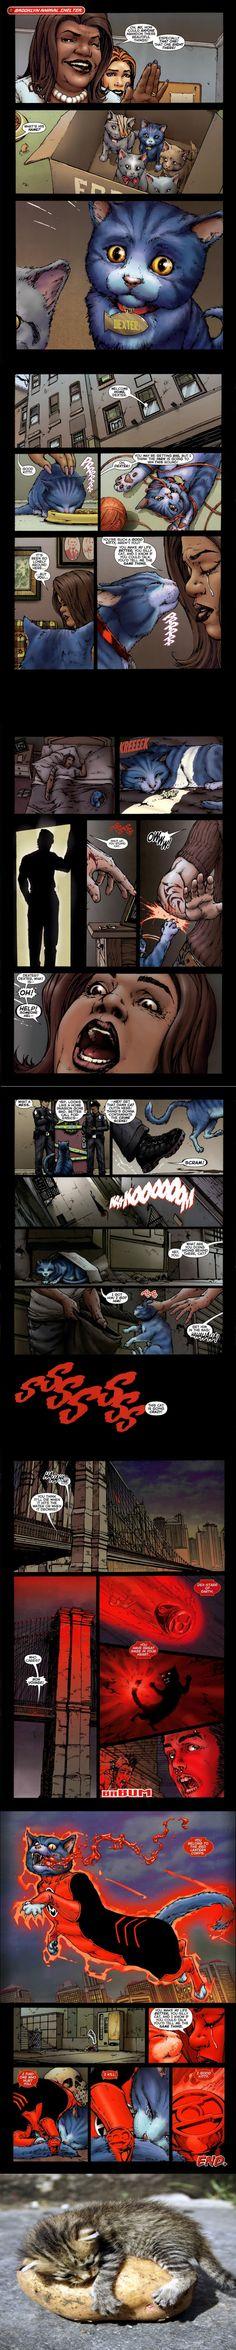 Dex Starr, the Red Lantern's Origin